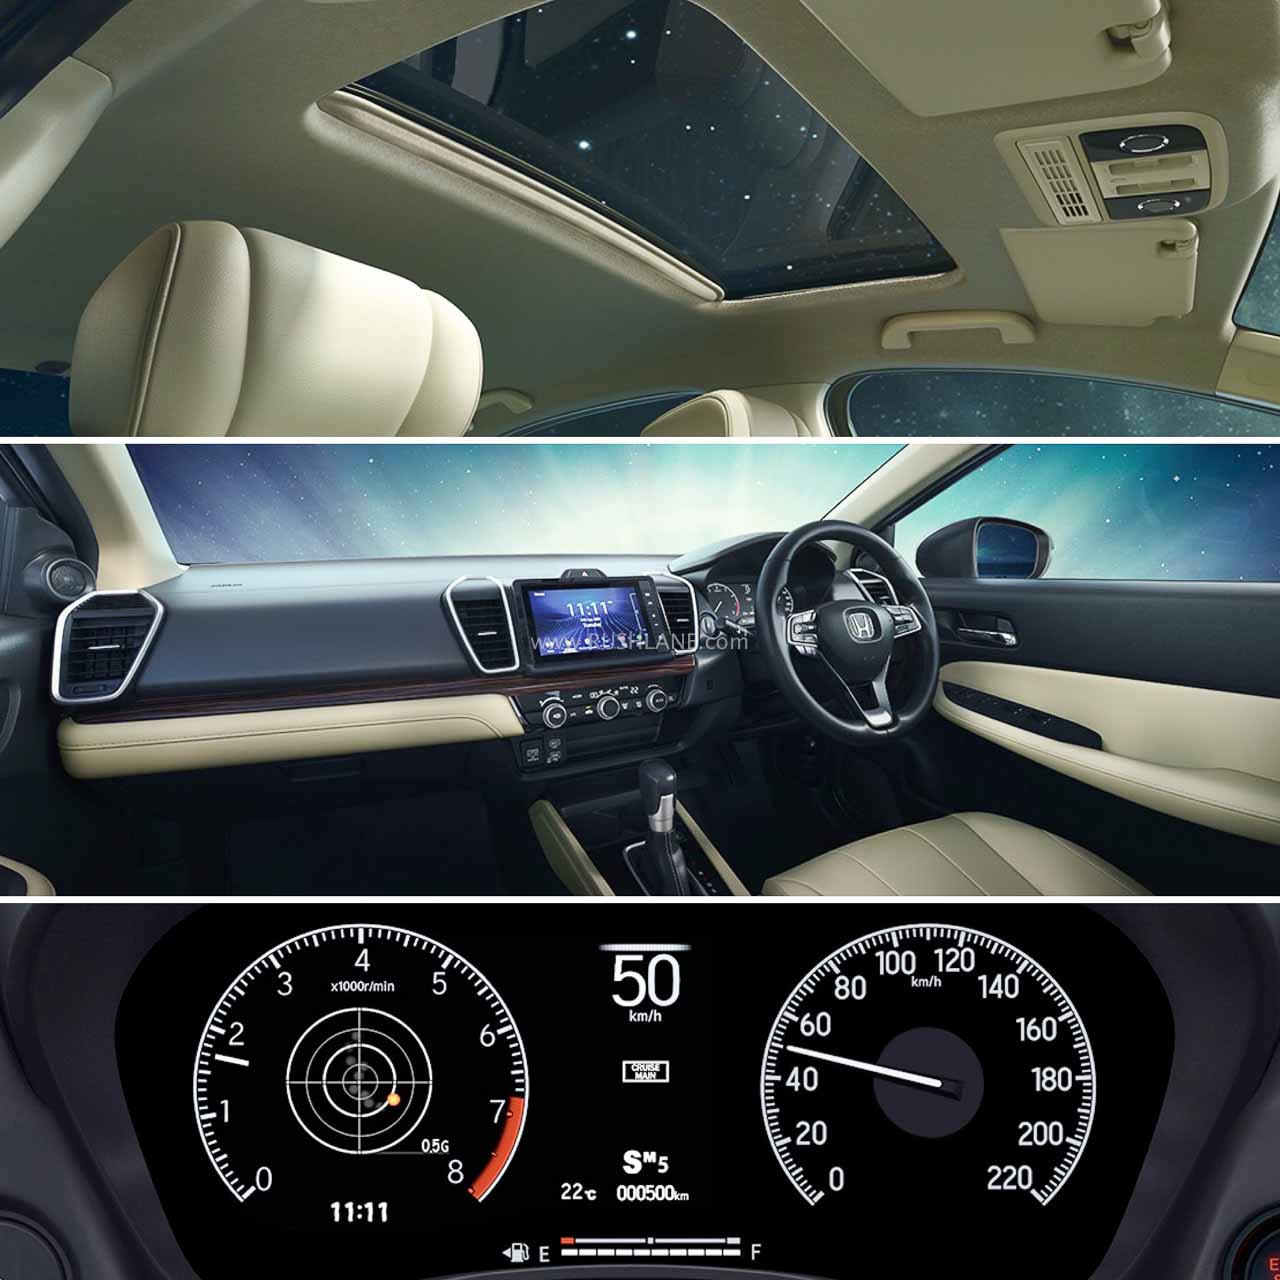 2020 Honda City interiors